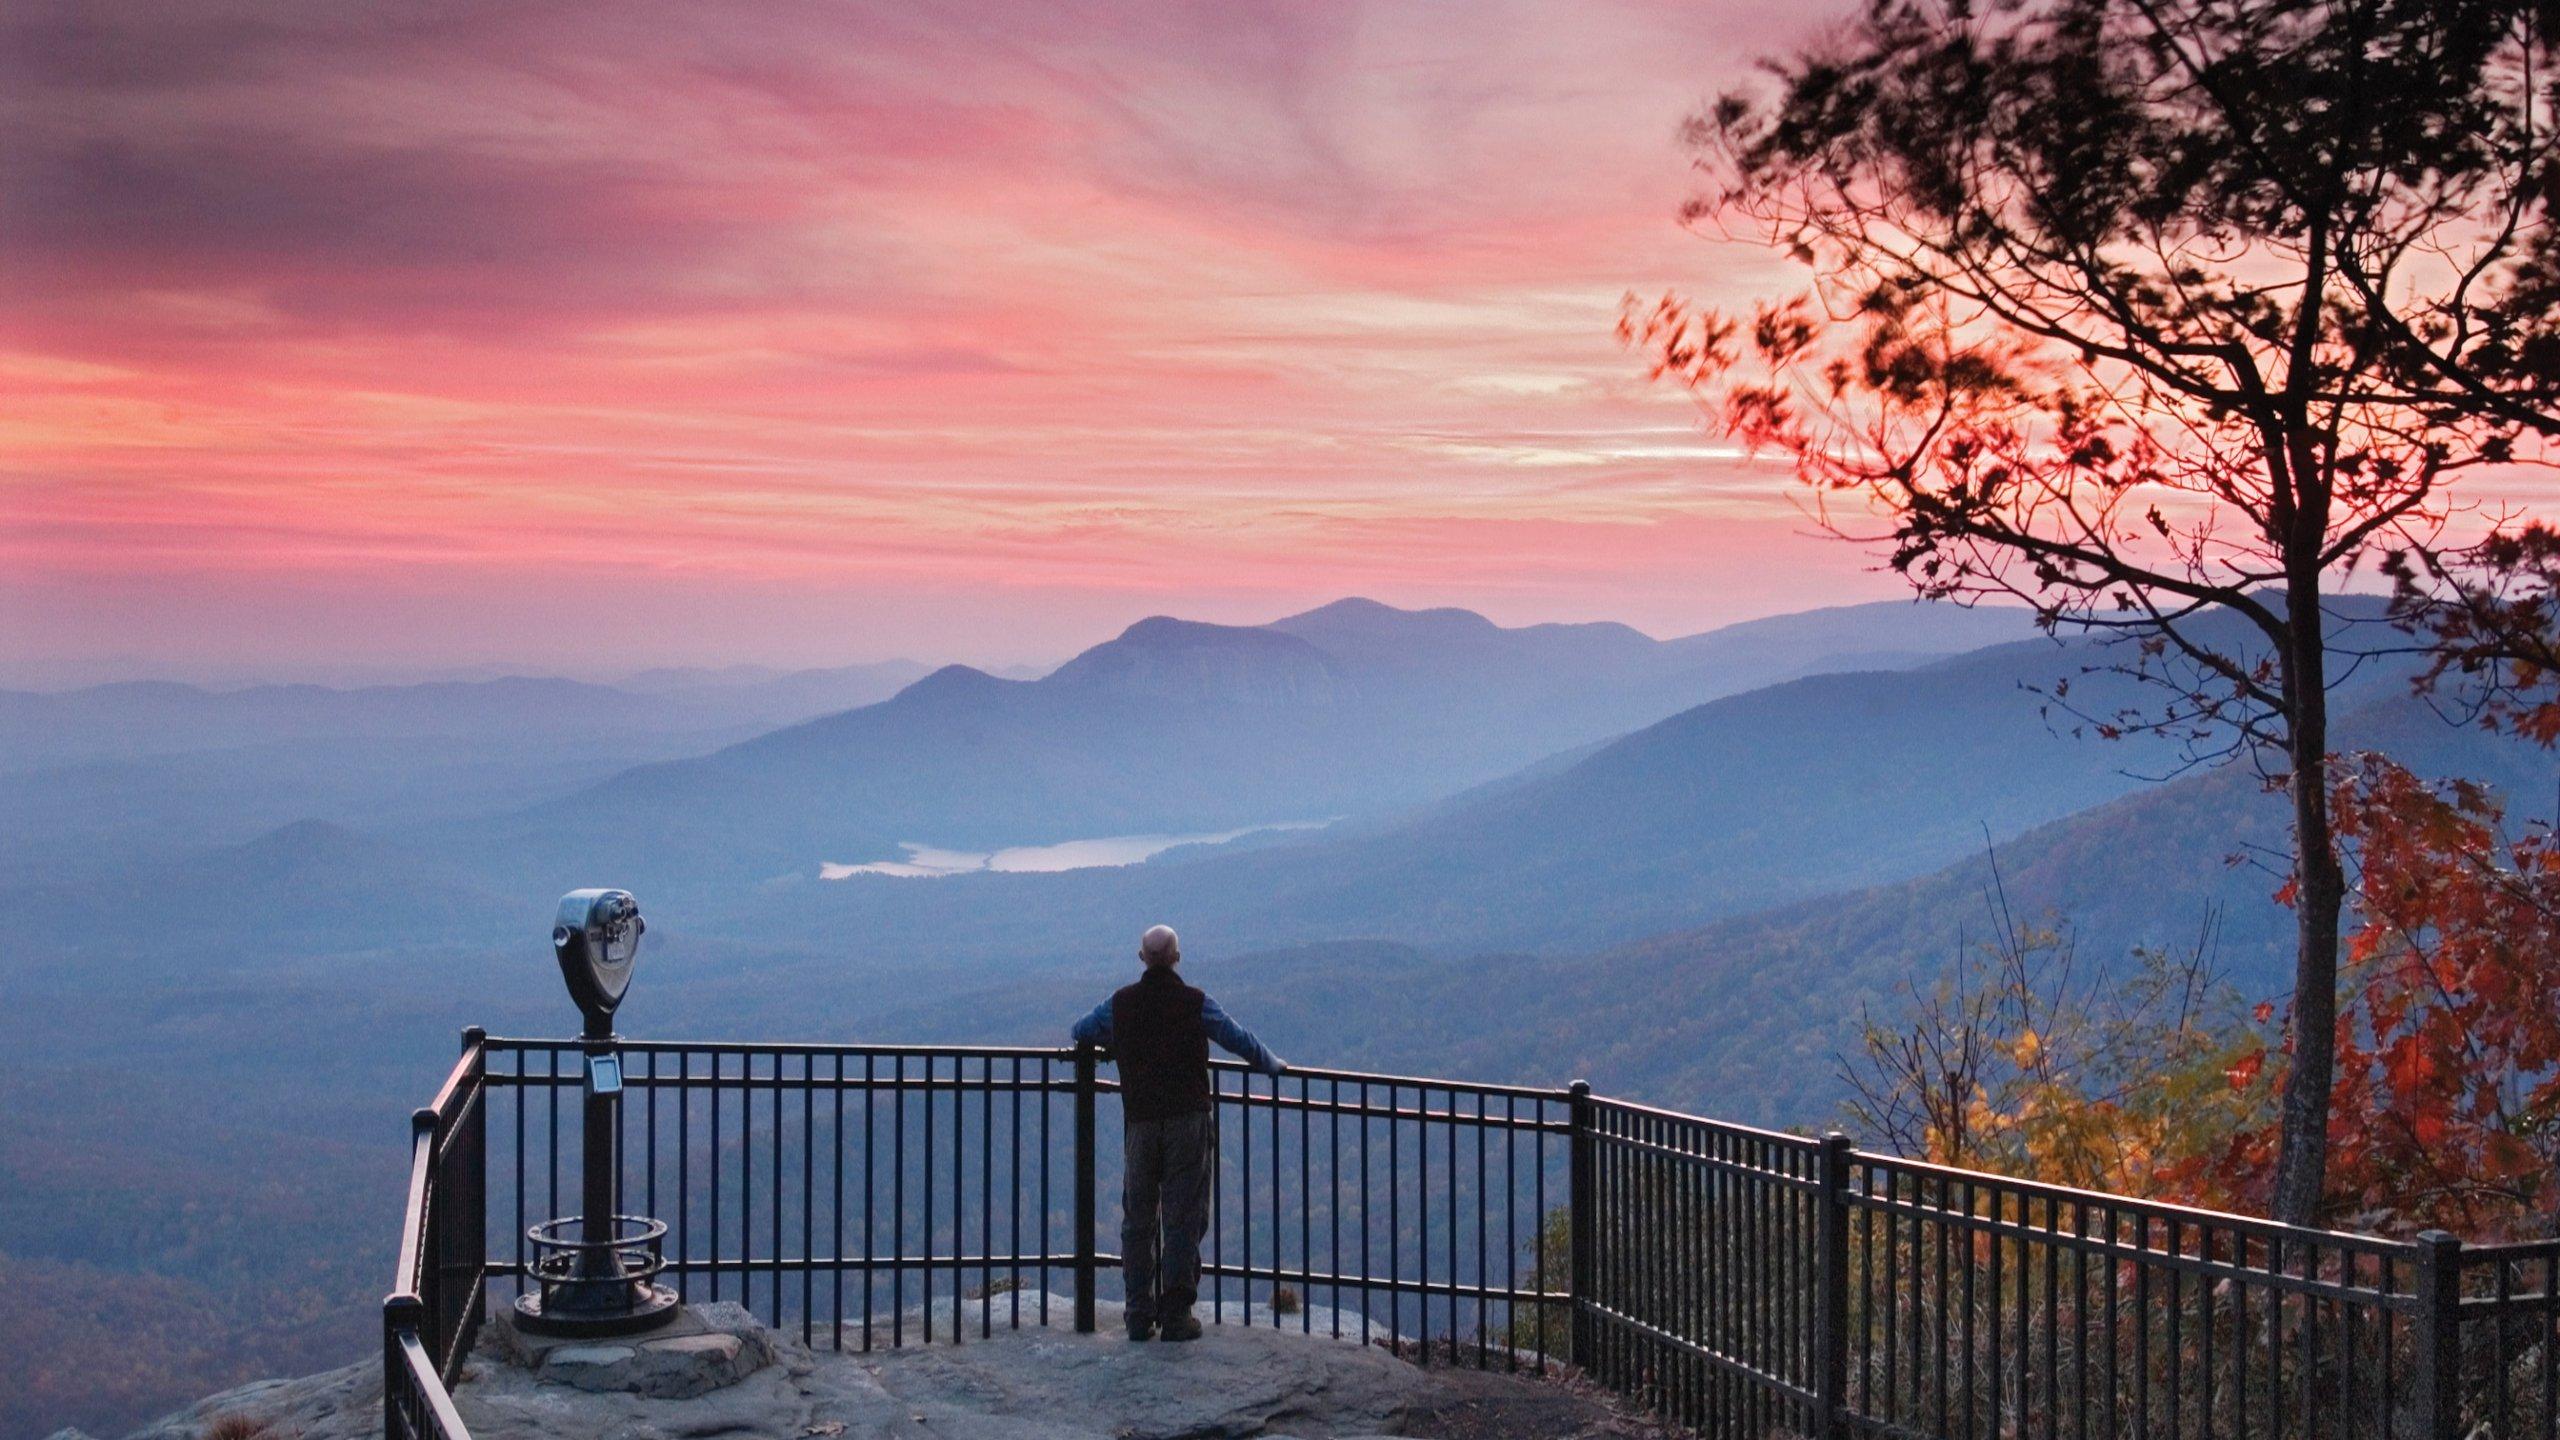 Upcountry South Carolina, South Carolina, United States of America